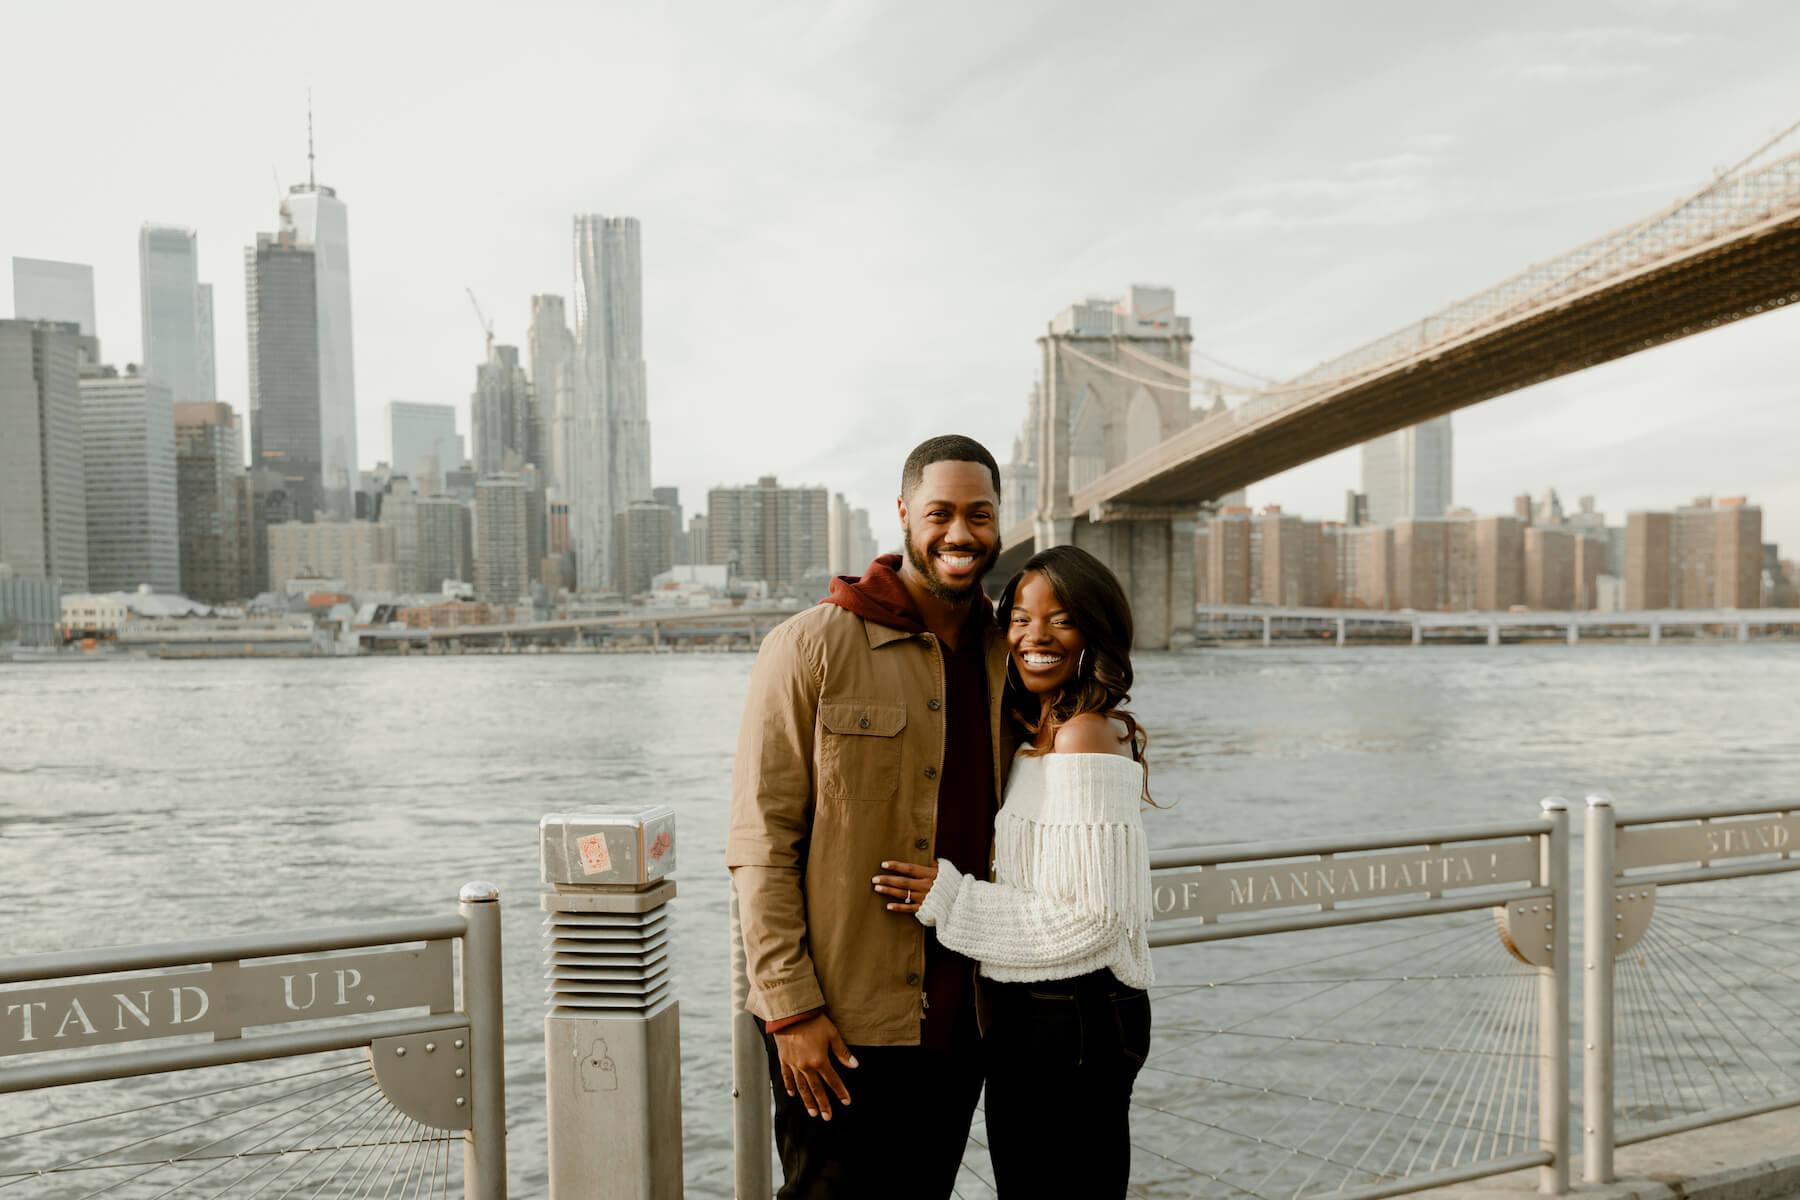 new-york-city-11-21-2019-just-because-3_original